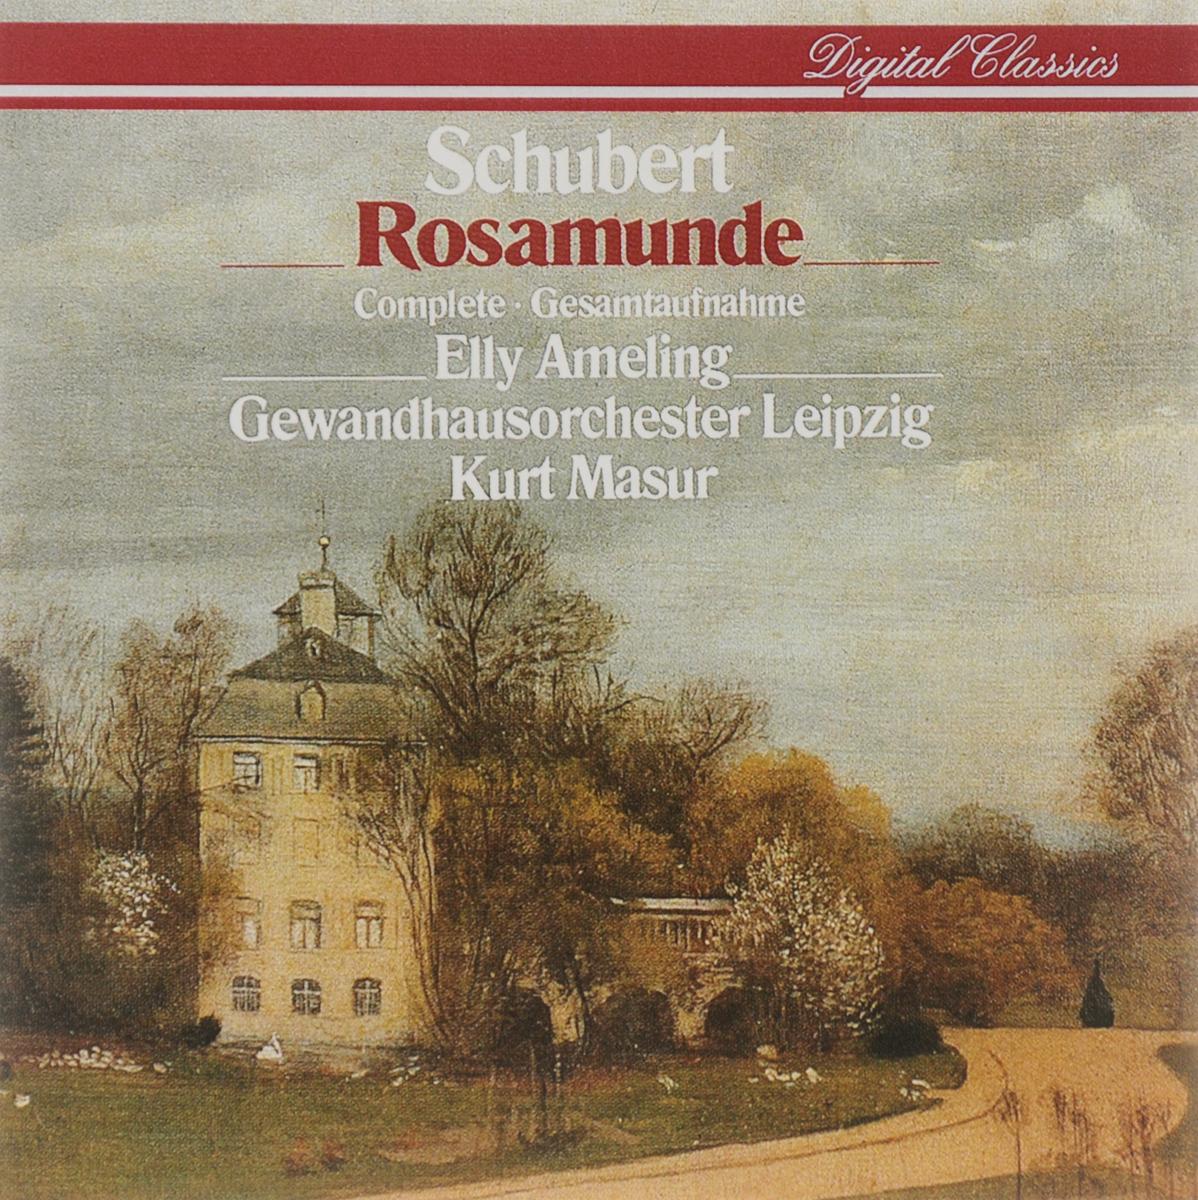 Курт Мазур,Elly Ameling,Gewandhausorchester Leipzig Kurt Masur. Schubert. Rosamunde